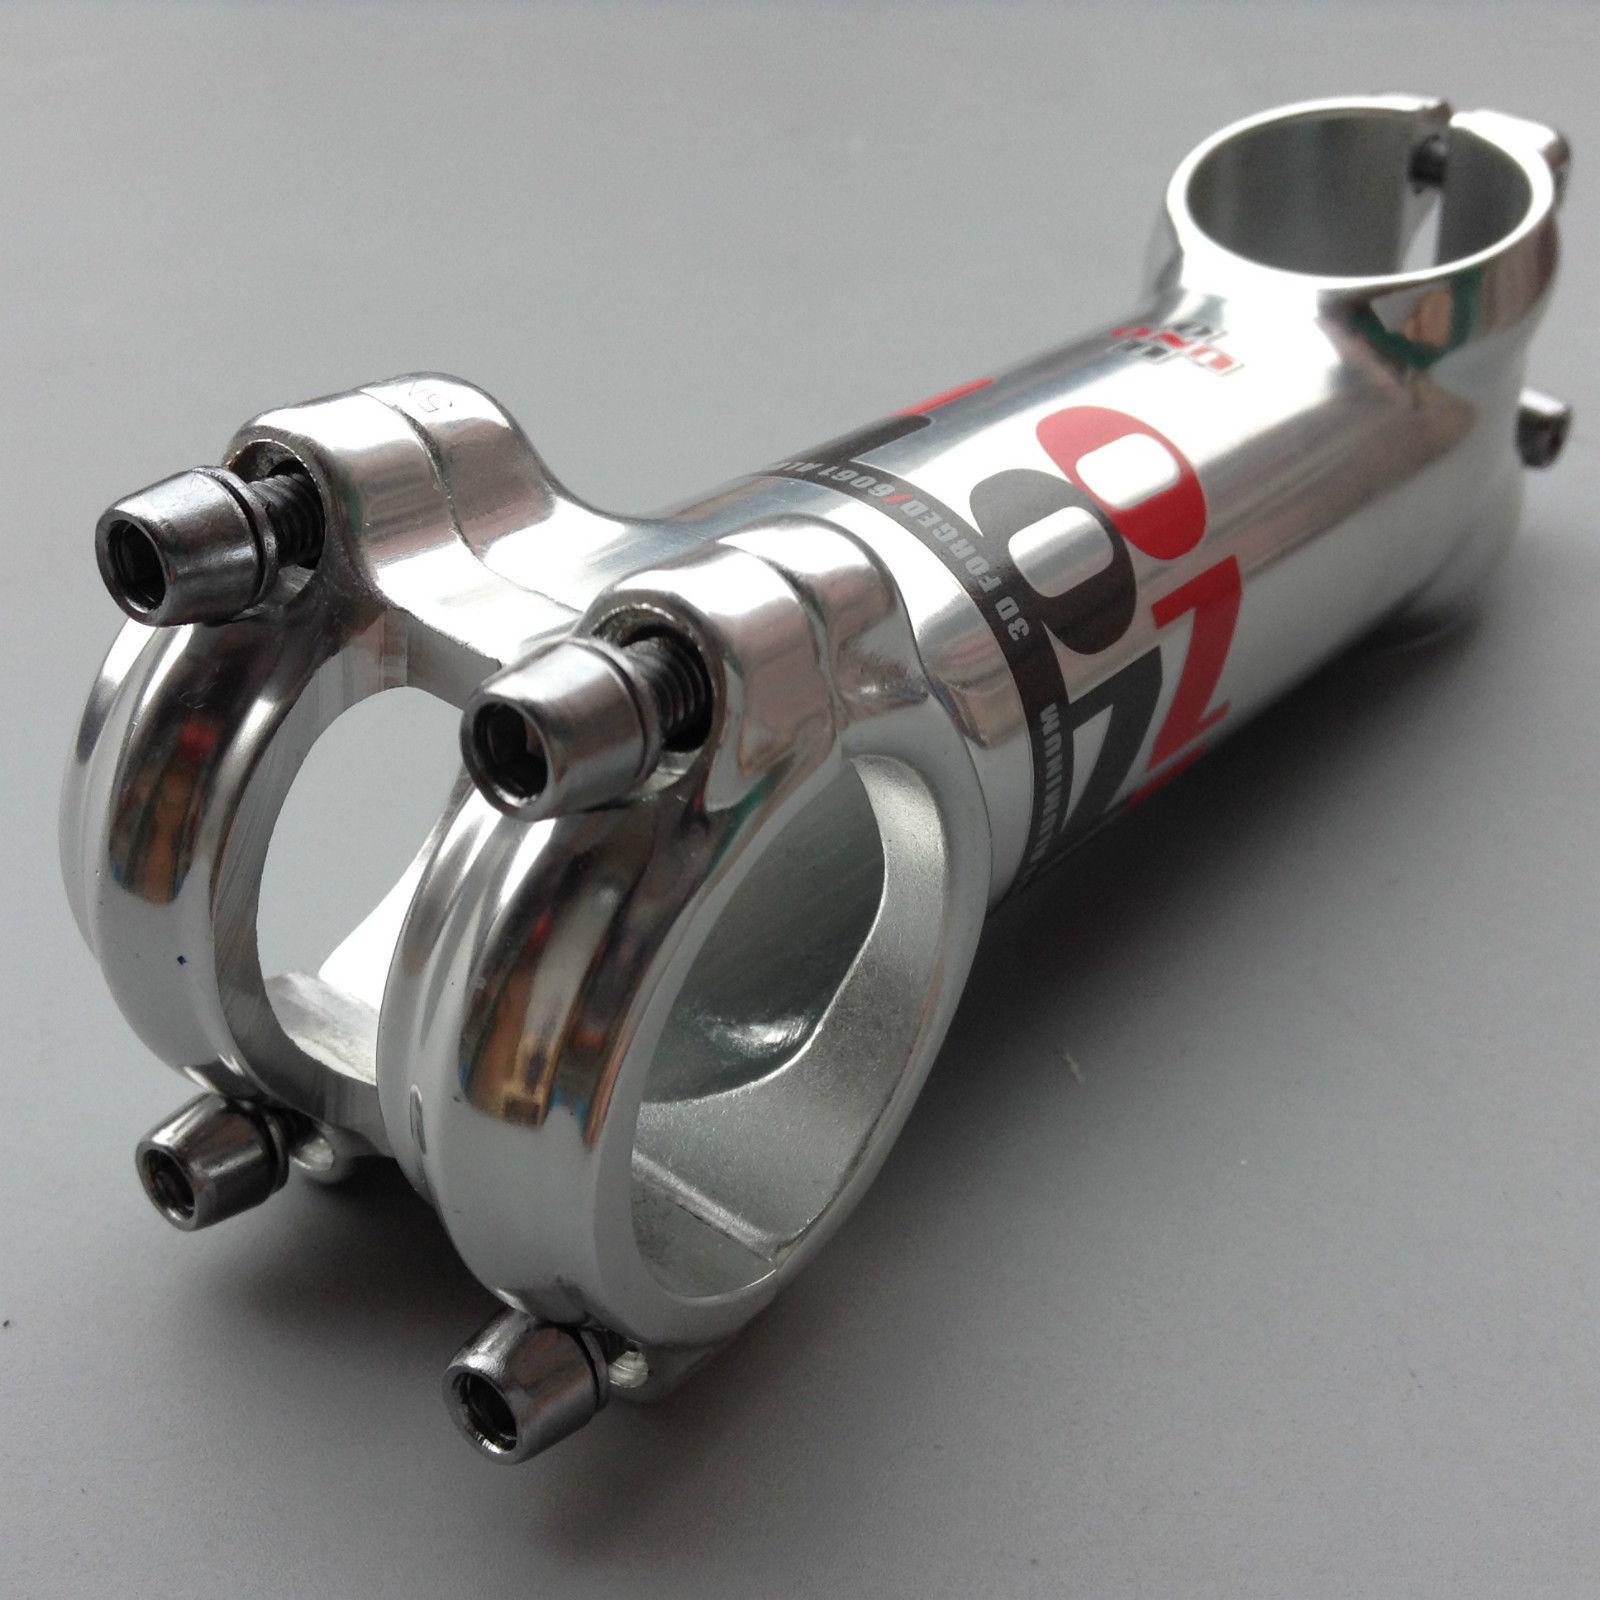 1pc MTB Road Mountain Bike Bicycle Stem Aluminium Alloy 7°//17°//35° 31.8*60-130mm